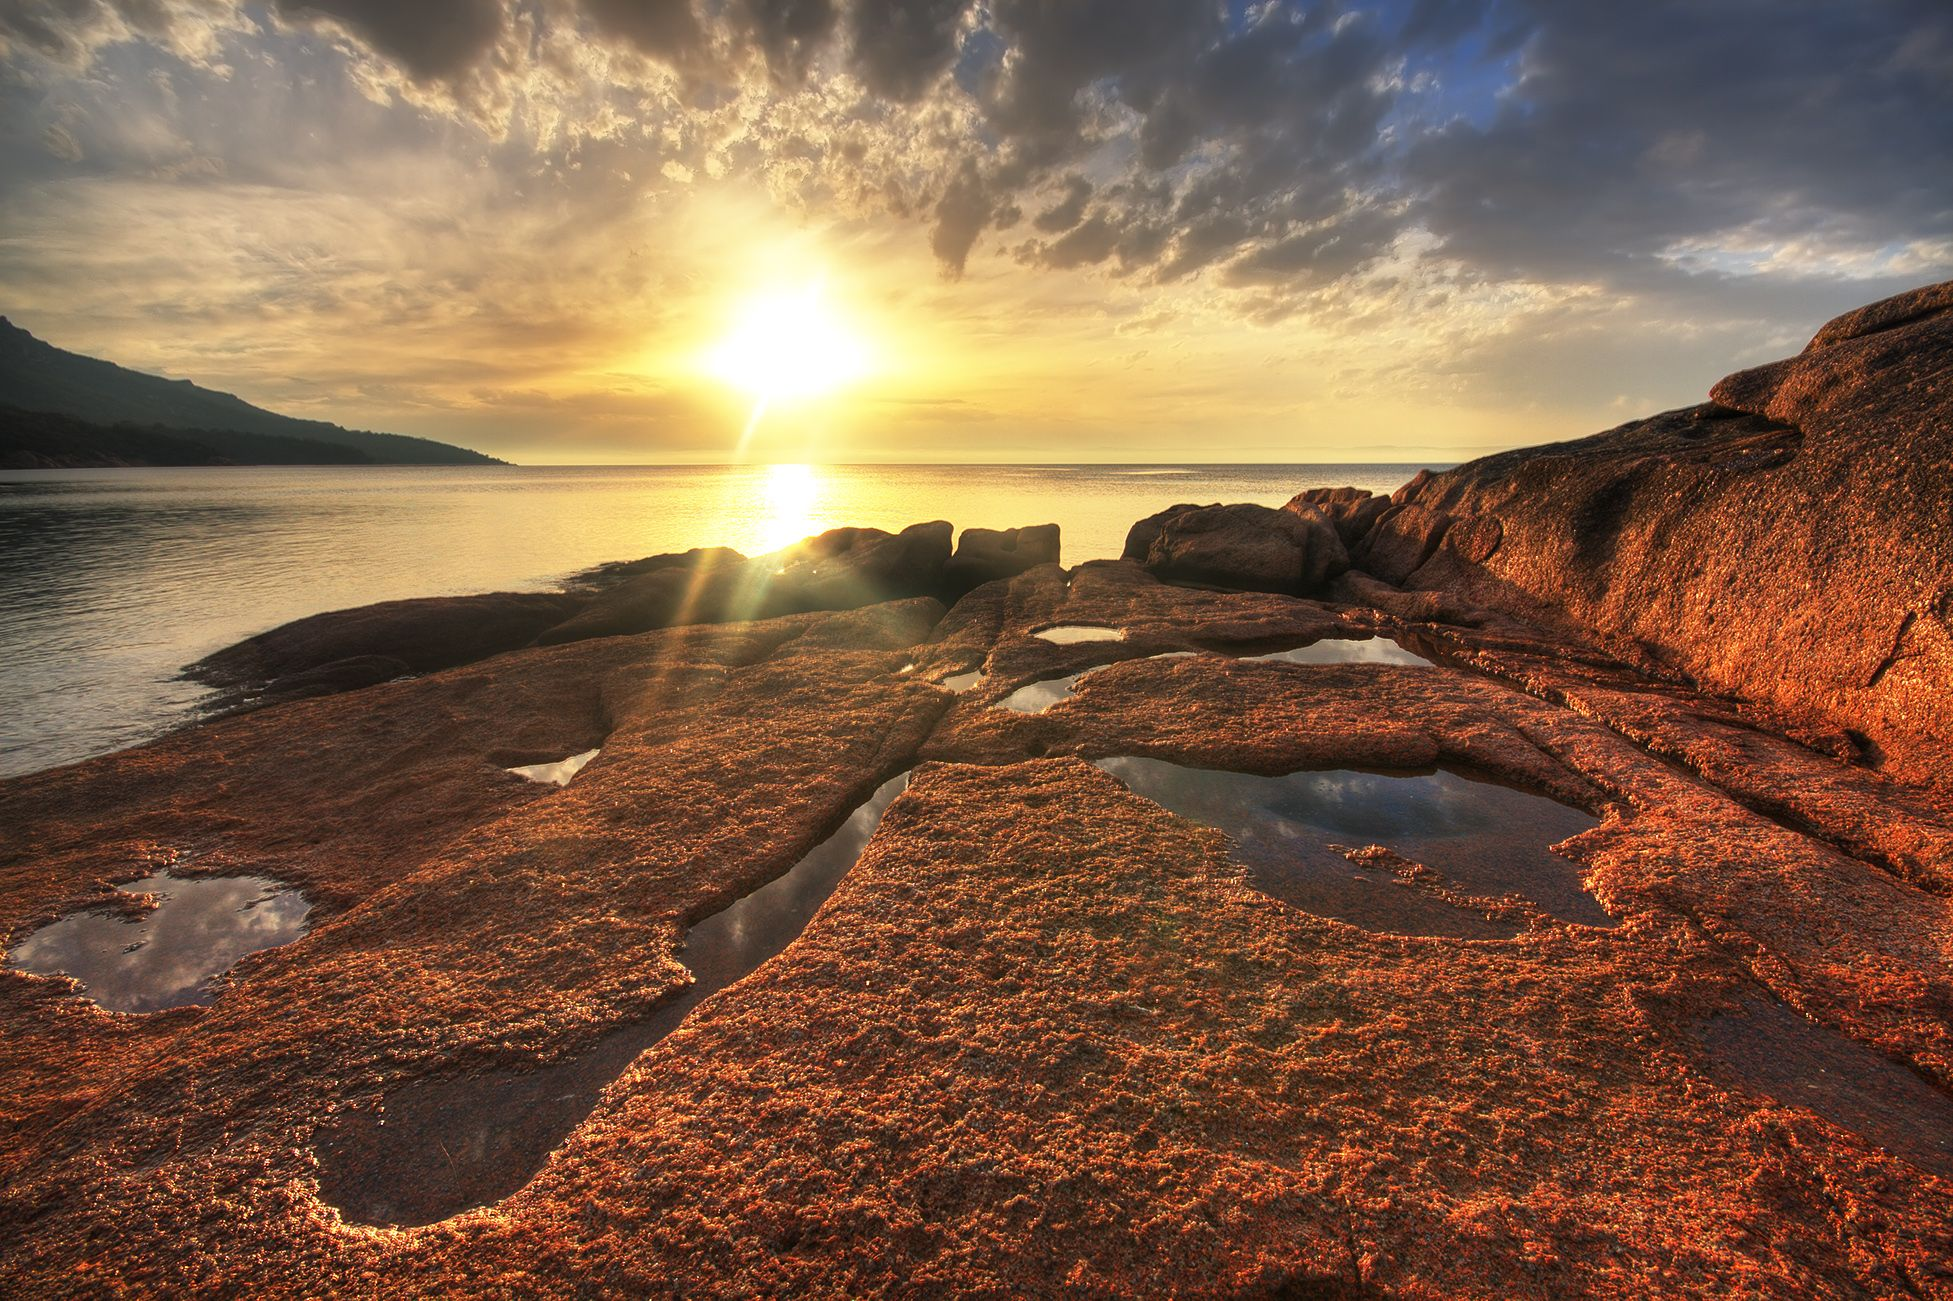 Sunset At Honeymoon Bay Freycinet Peninsula Tasmania Australia - 12 destinations to see the most beautiful sunsets ever